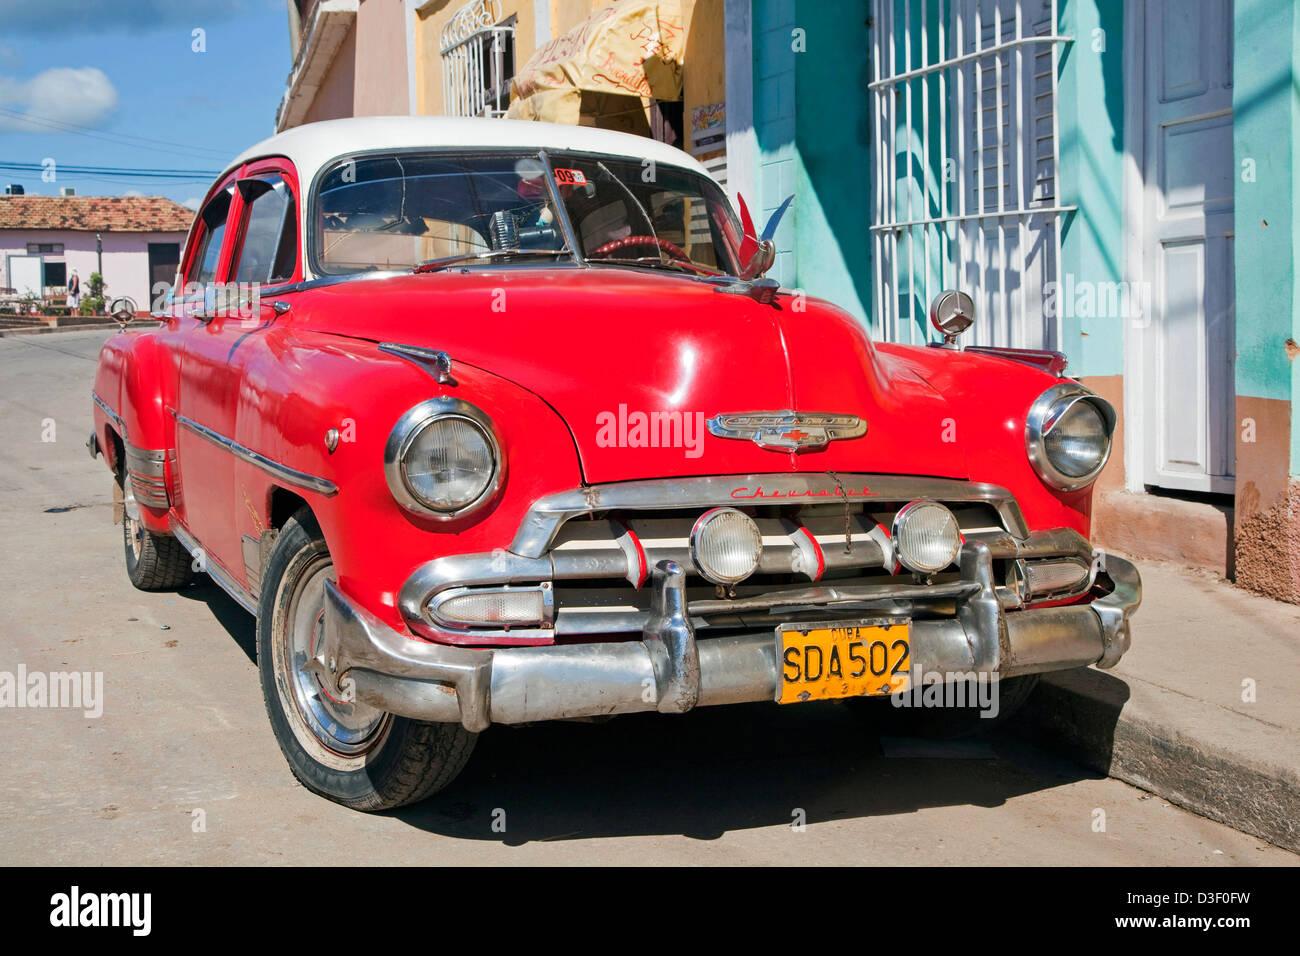 1950s Chevrolet Car Stock Photos & 1950s Chevrolet Car Stock Images ...